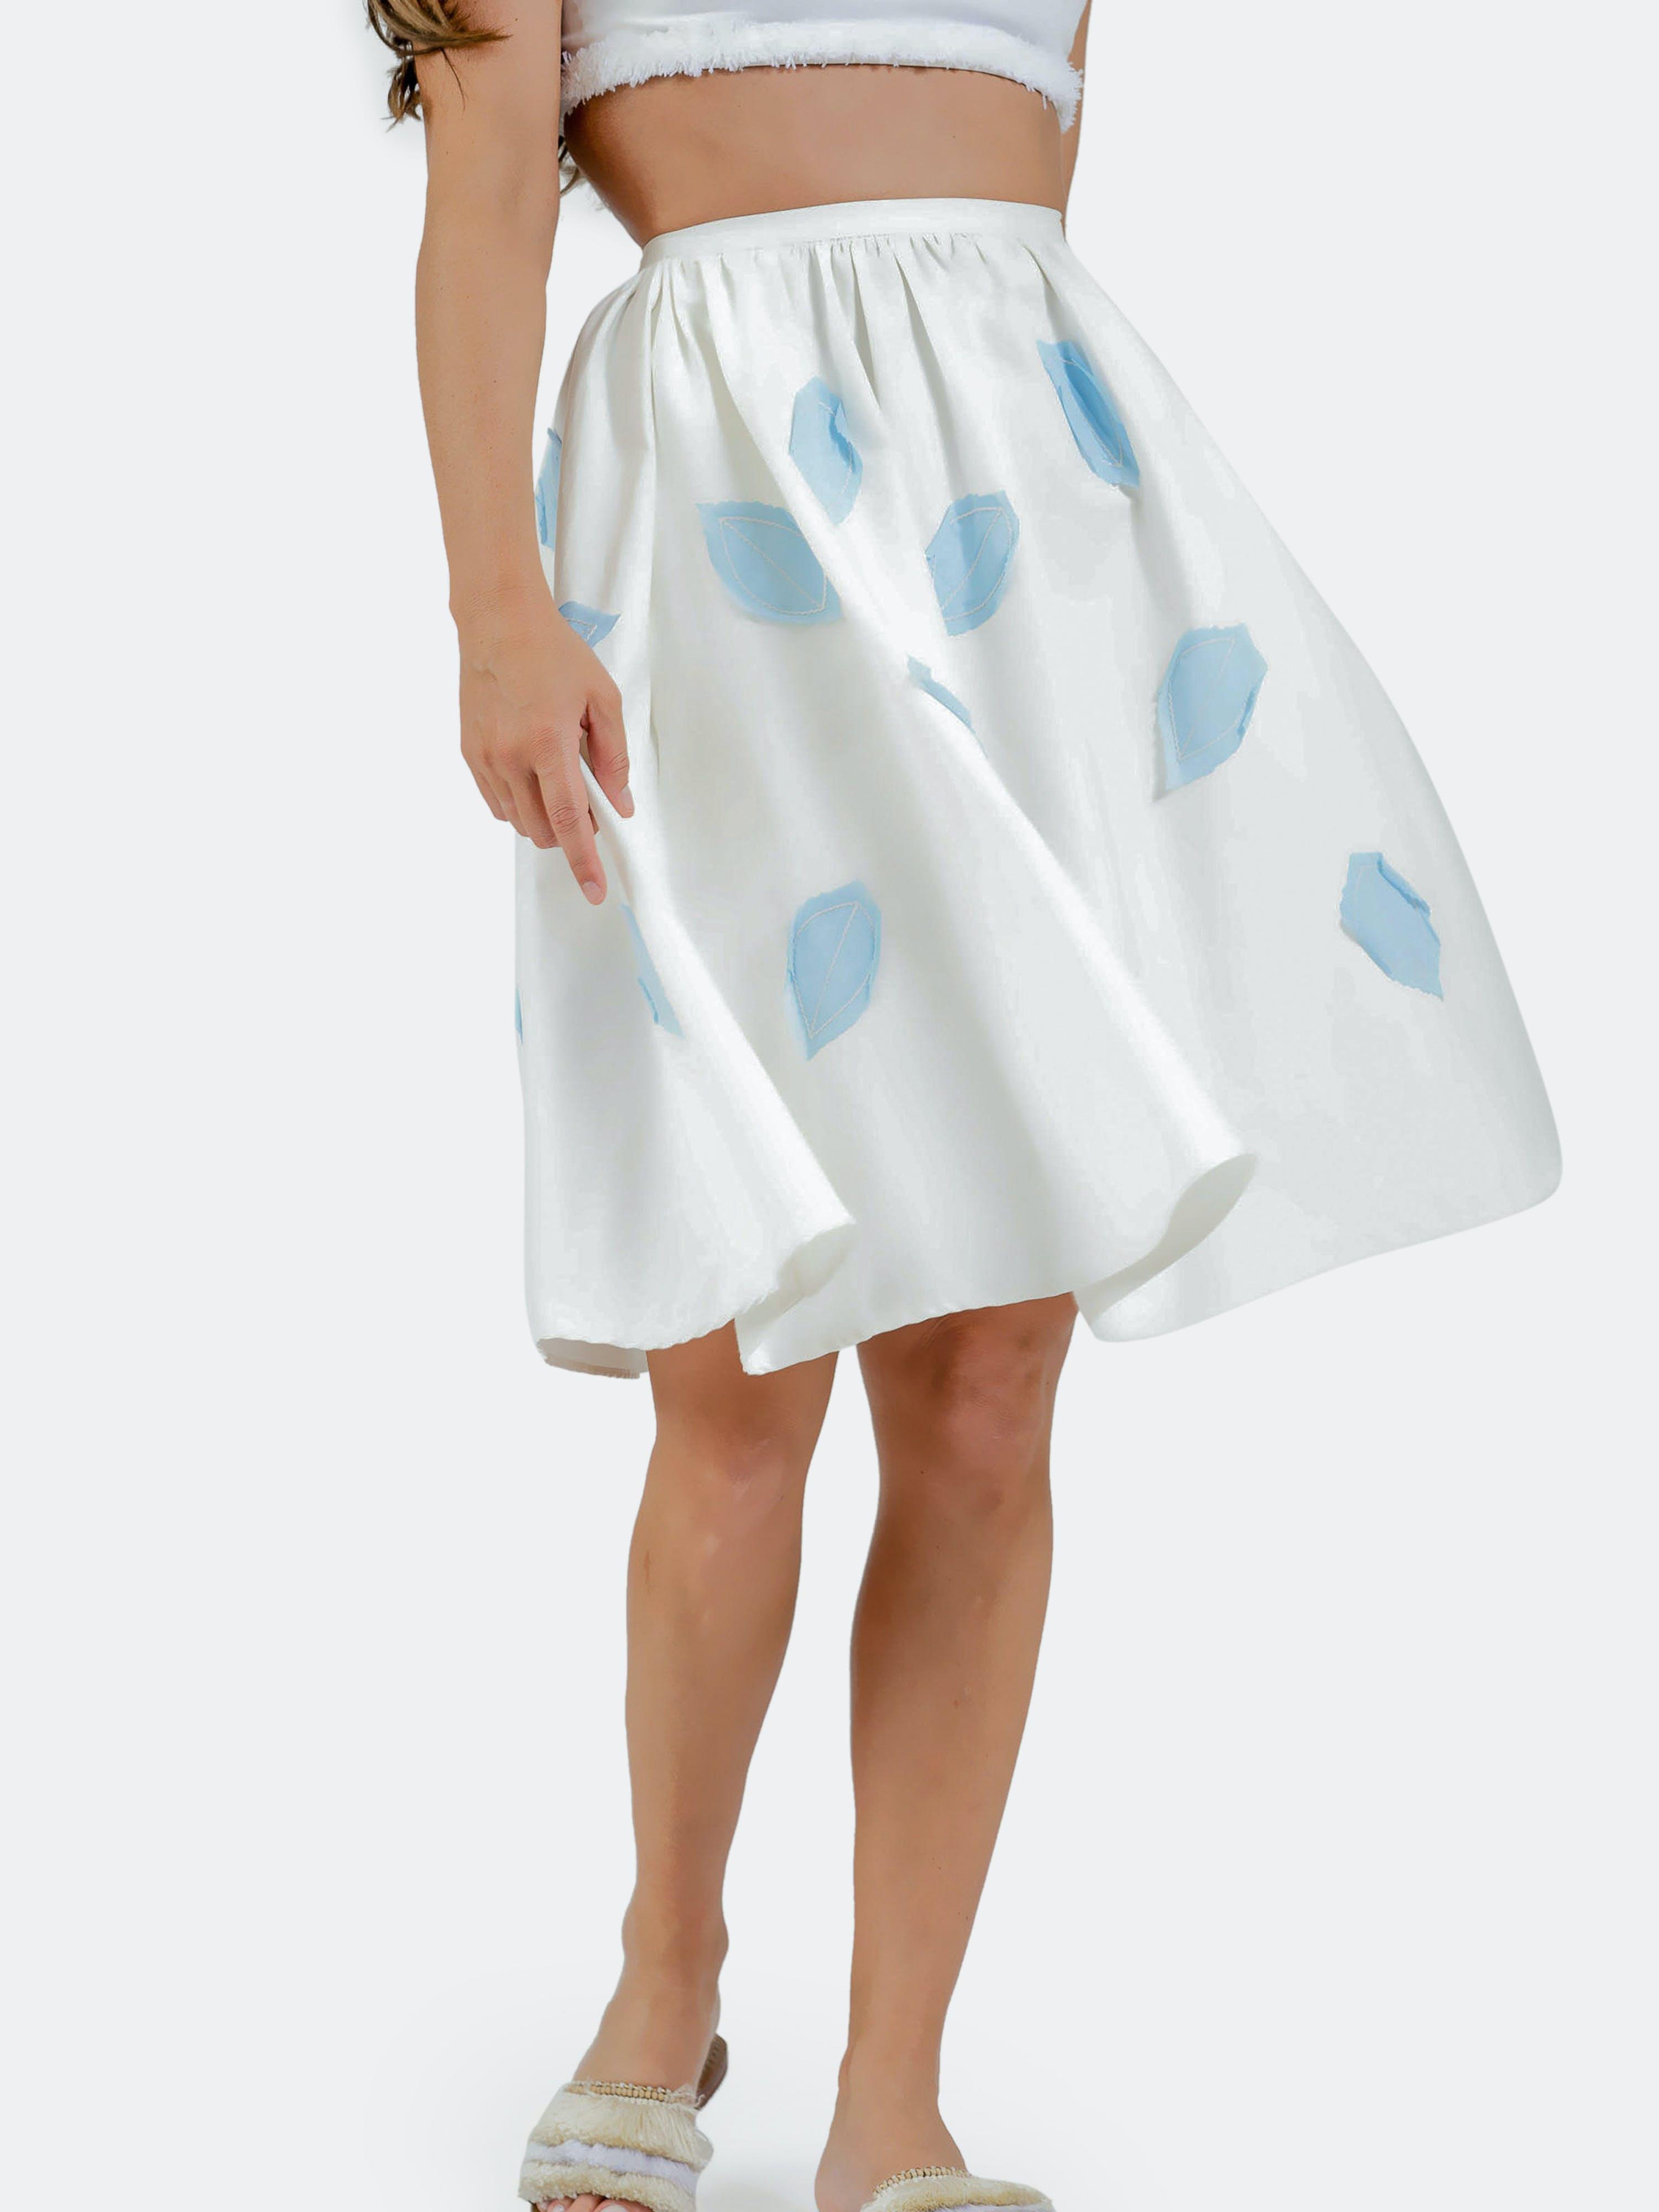 Palmier Meadow Lane Garden Skirt - L - Also in: S, M, XS  - White